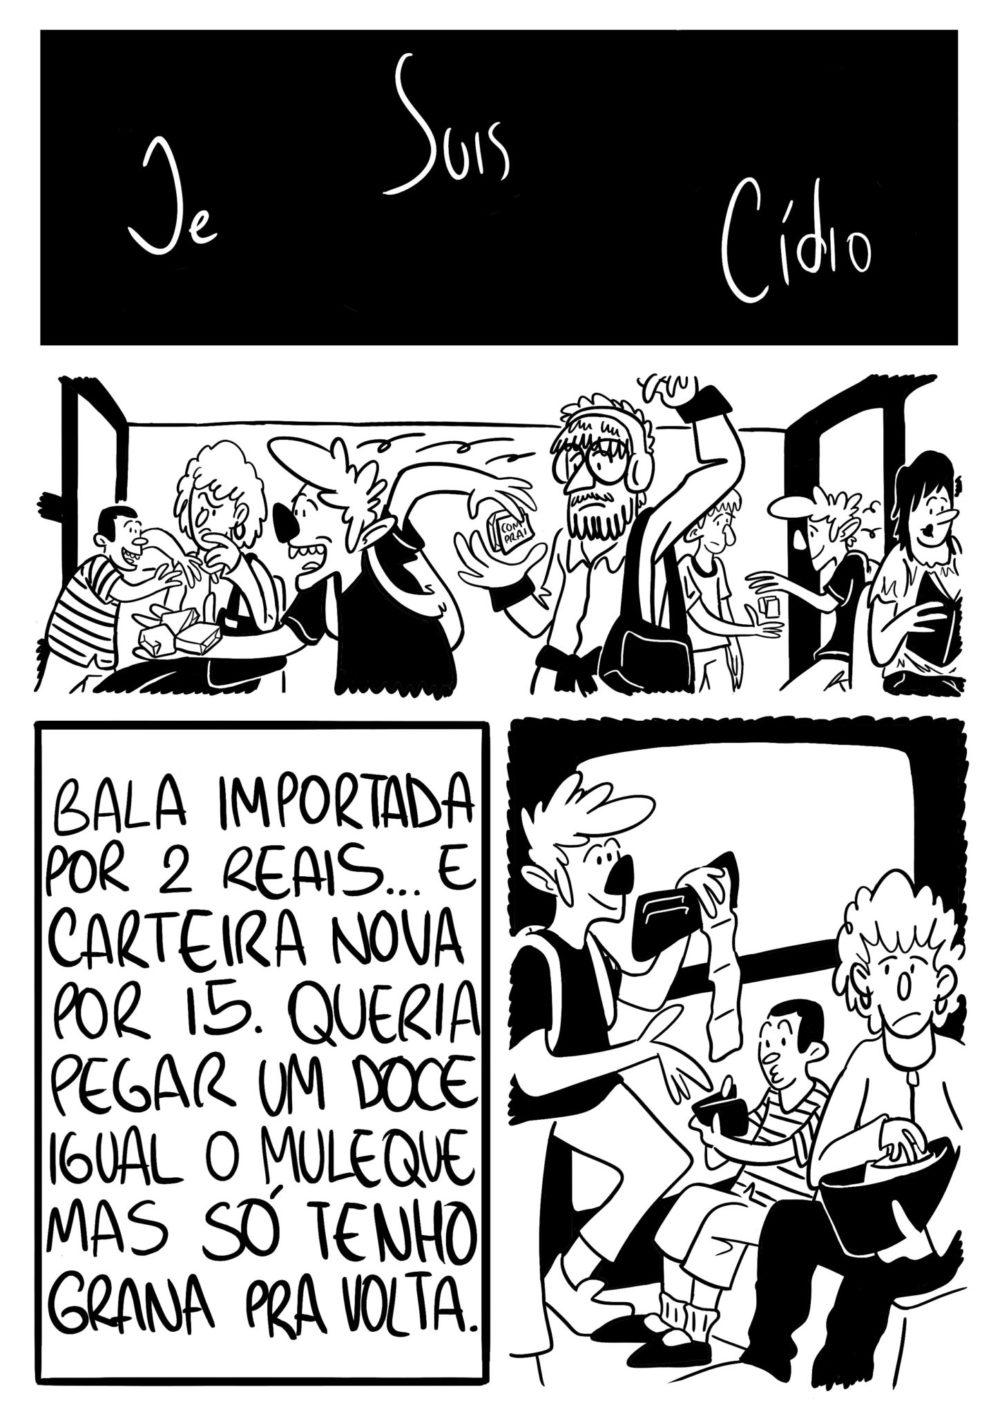 Je Suis Cídio #4, por João B. Godoi